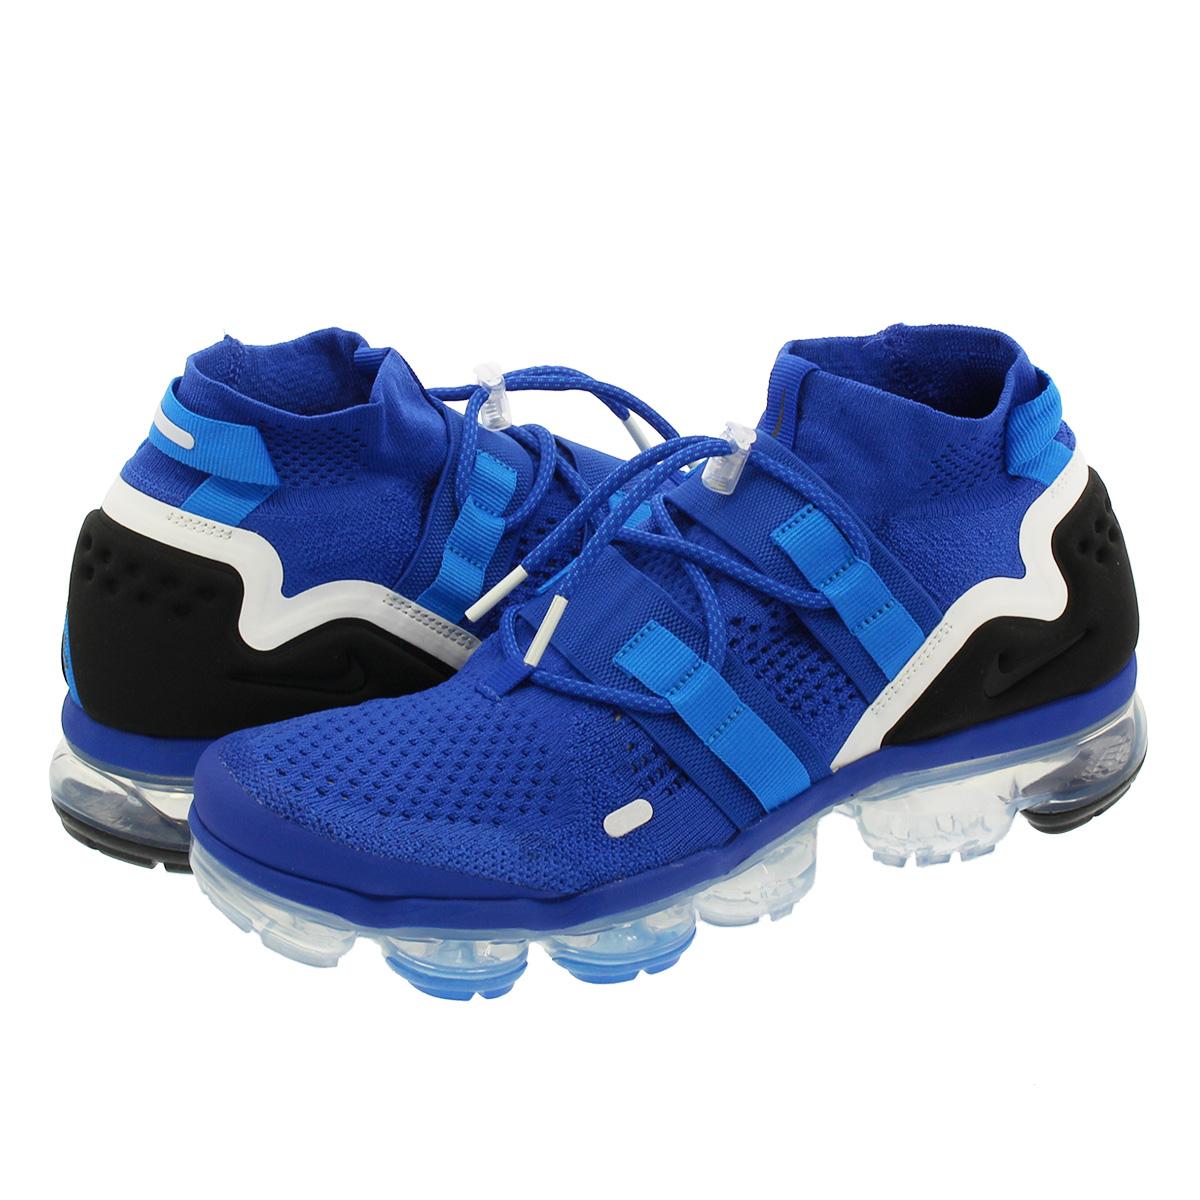 the latest da455 b1a48 NIKE AIR VAPORMAX FLYKNIT UTILITY Nike vapor max fried food knit utility  GAME ROYAL/BLACK/PHOTO BLUE/SUMMIT WHITE ah6834-400